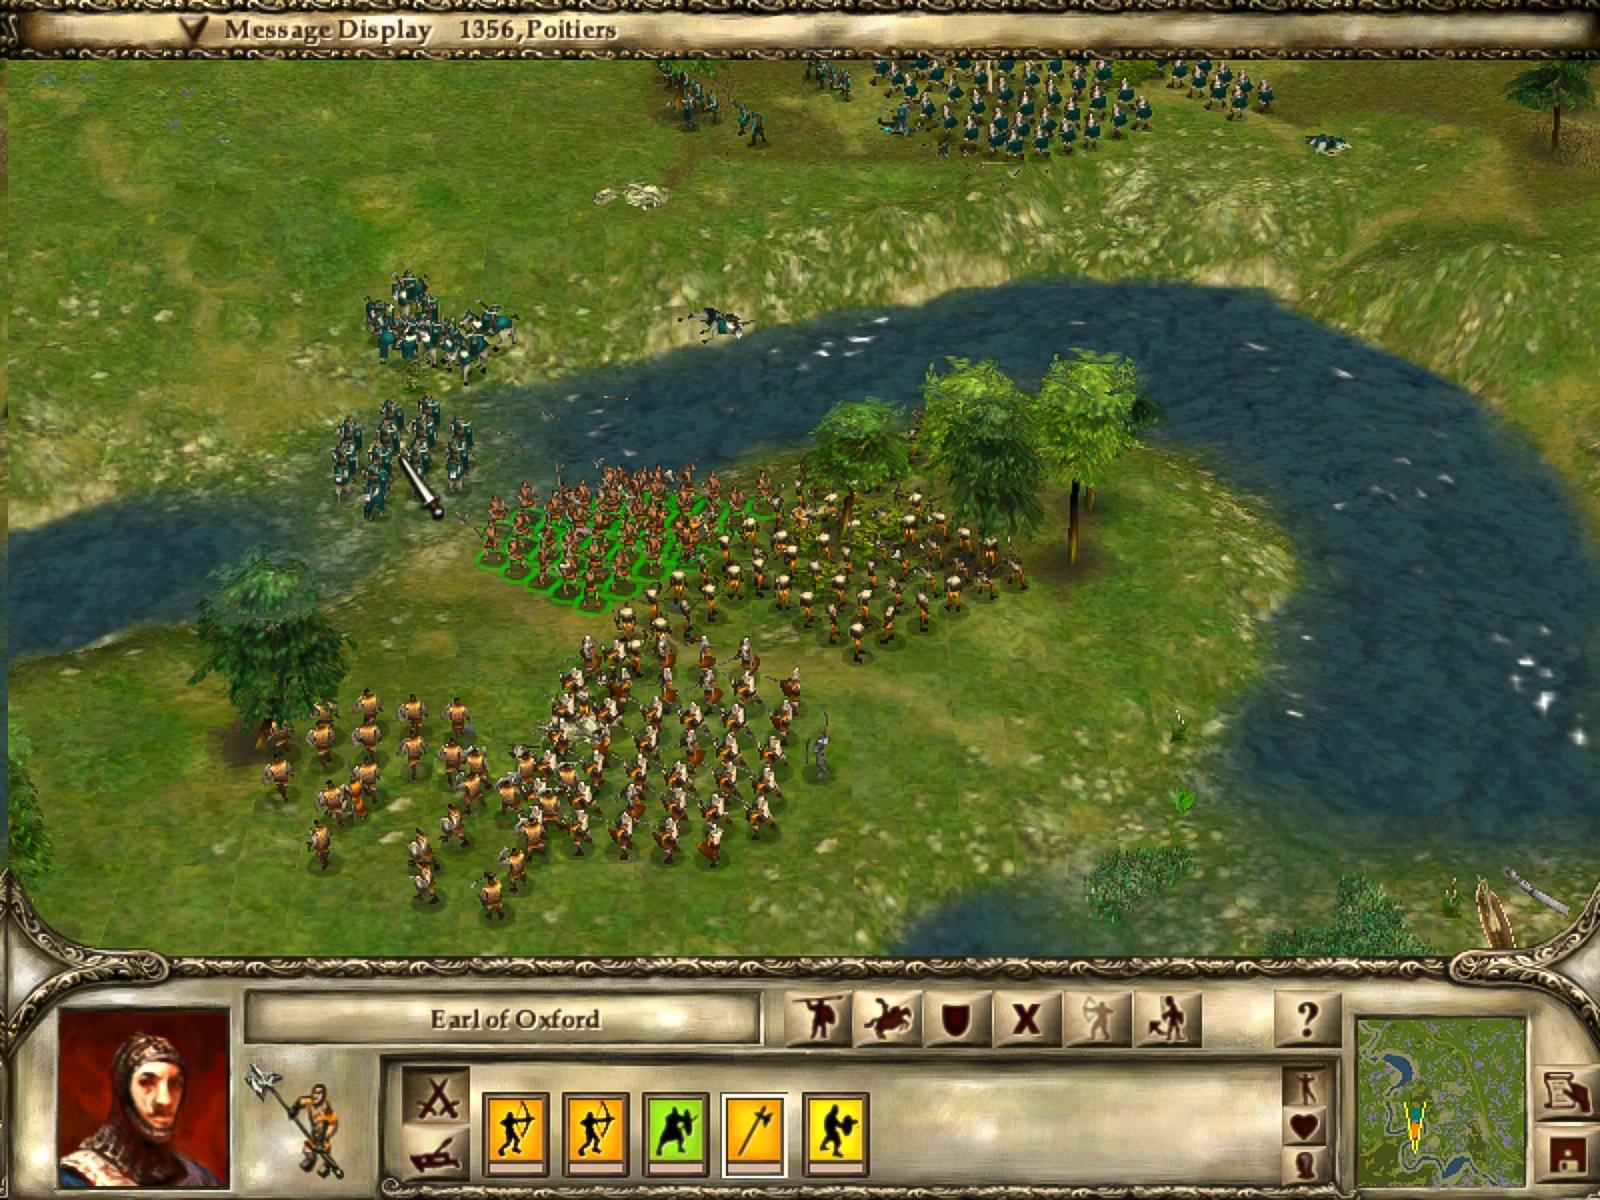 Lords of the Realm III screenshot